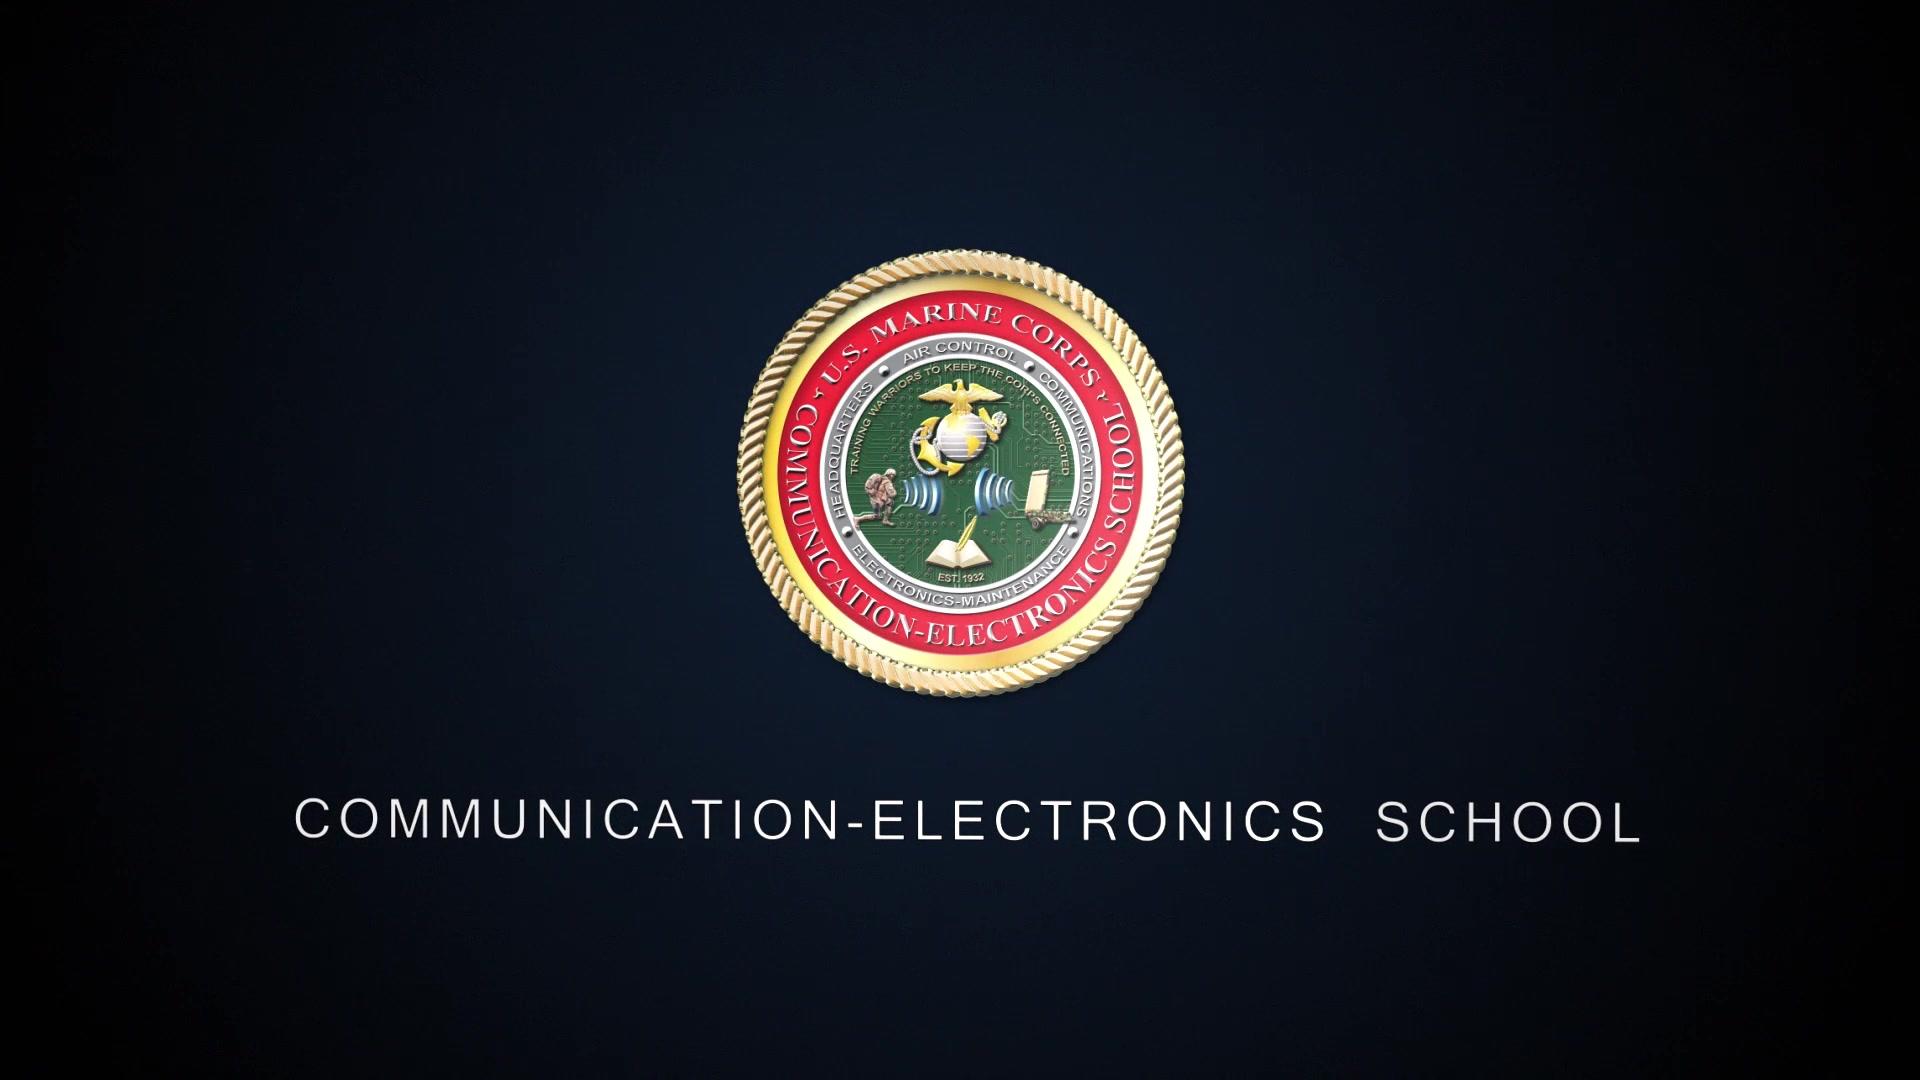 Marine Corps Communication-Electronics School